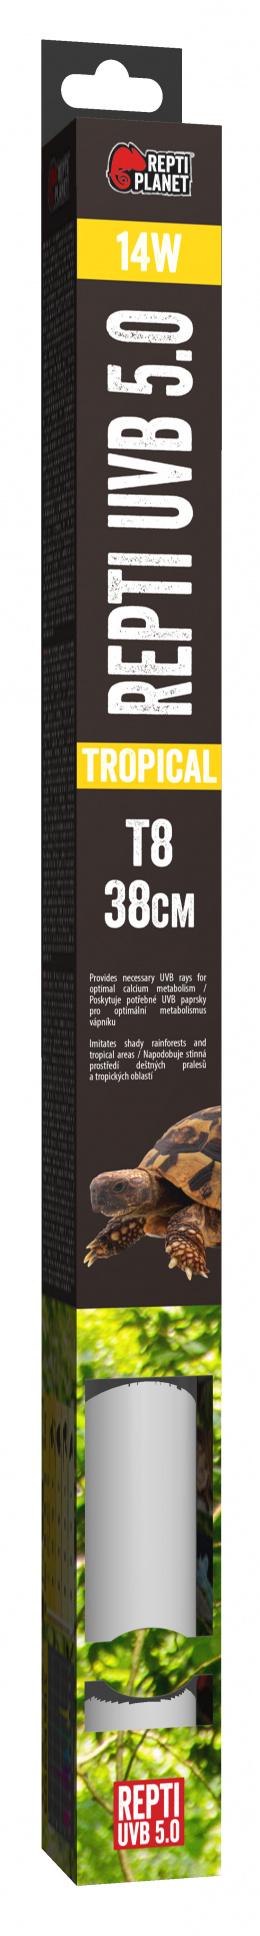 RP ziarivka Fluorescent UVB 5.0 38cm 14W